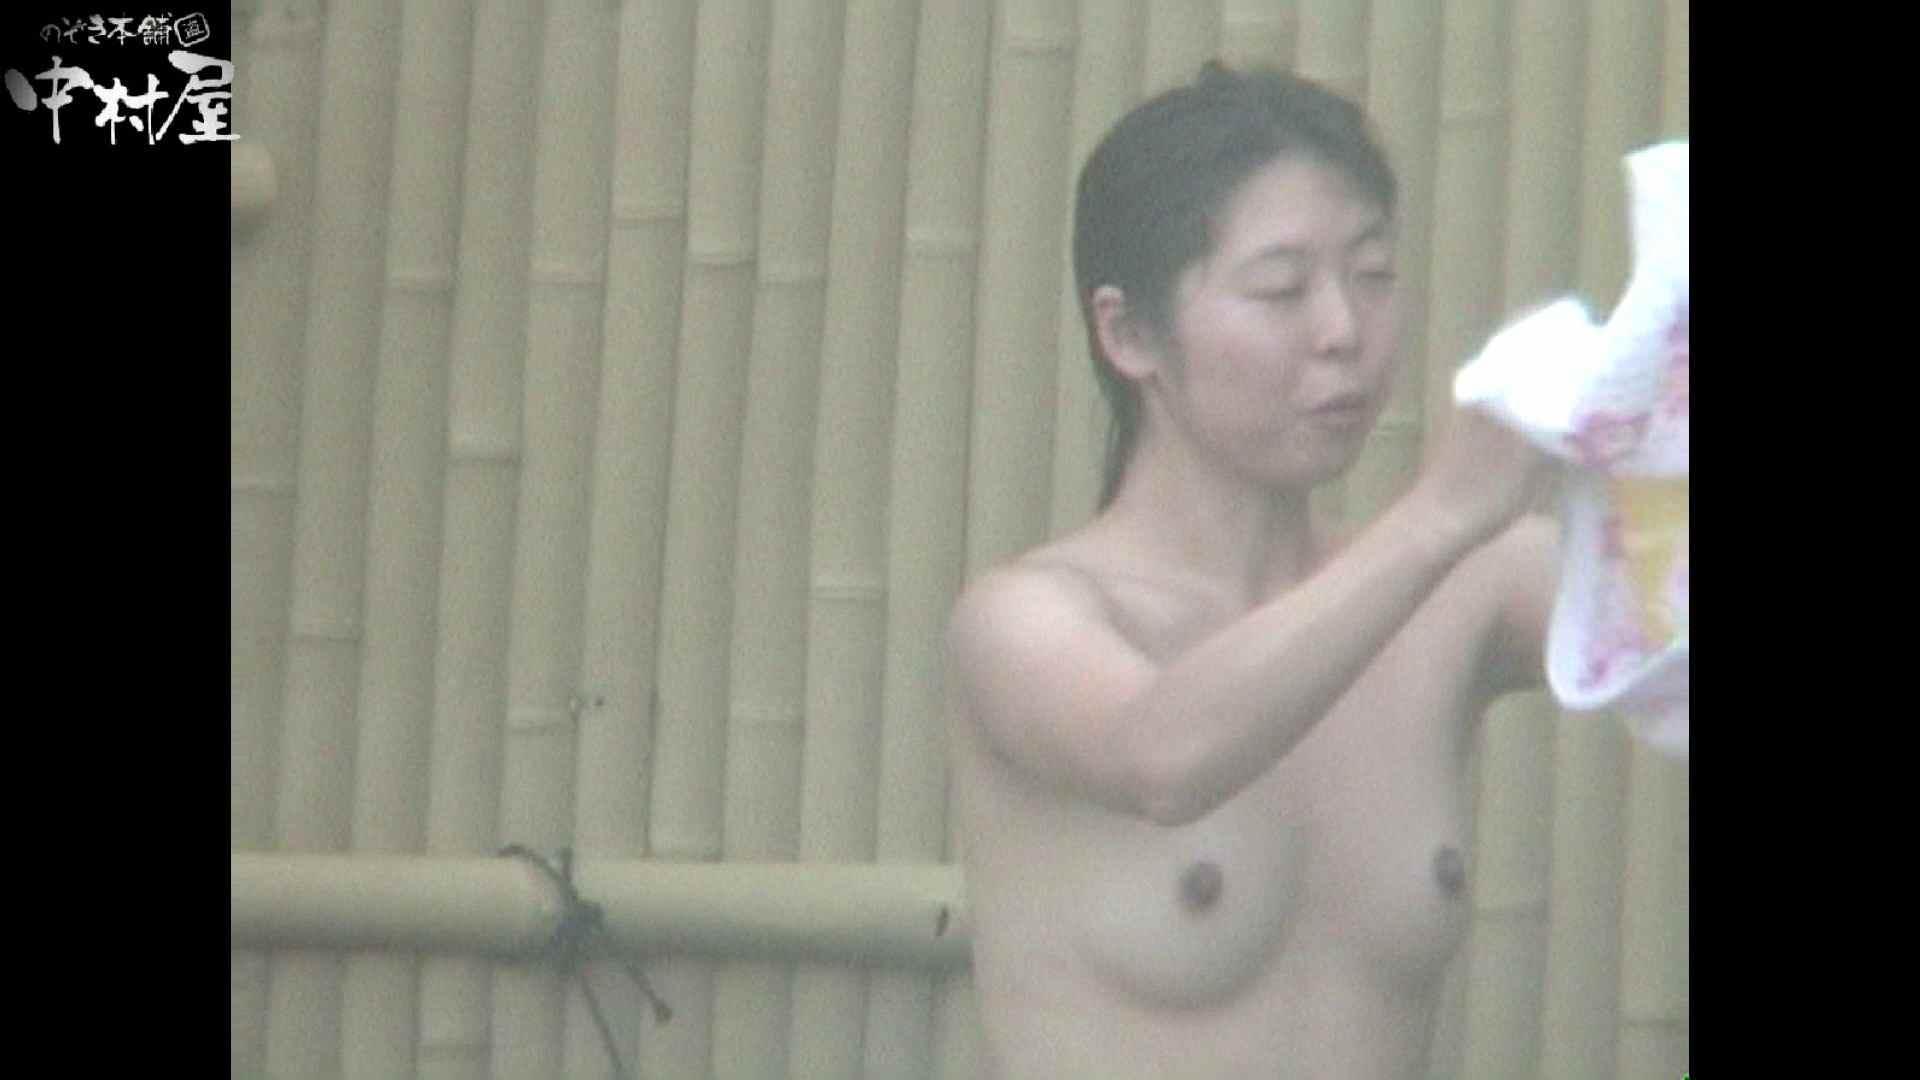 Aquaな露天風呂Vol.932 露天 オメコ動画キャプチャ 104pic 74